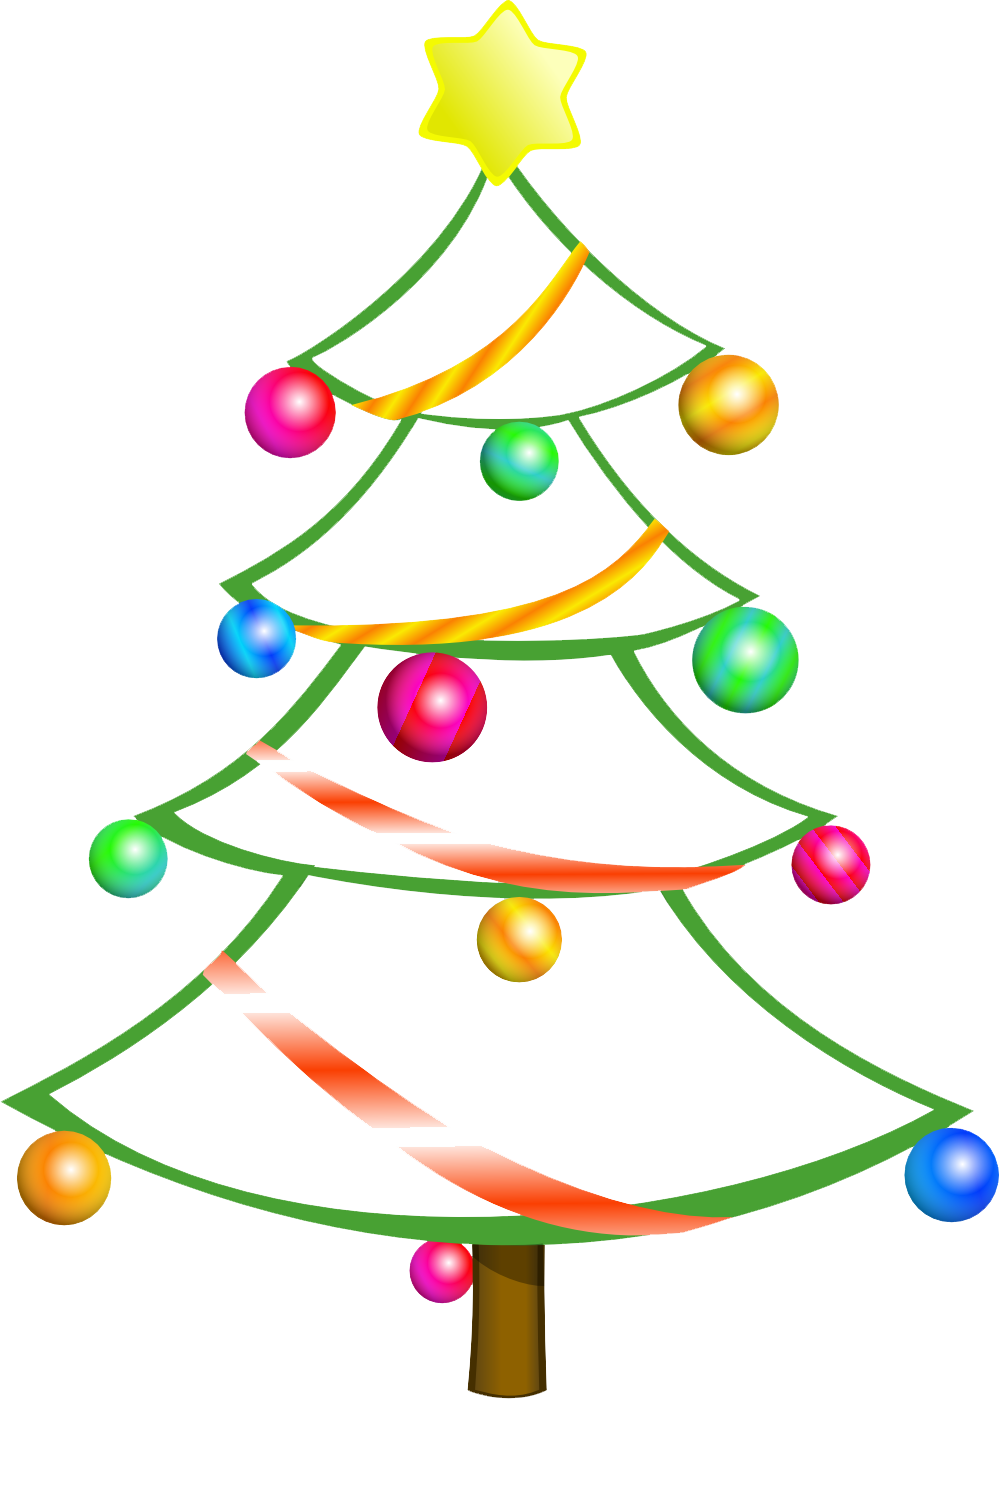 Free Christmas Tree Clip Art Borders | Clipart Panda - Free ...